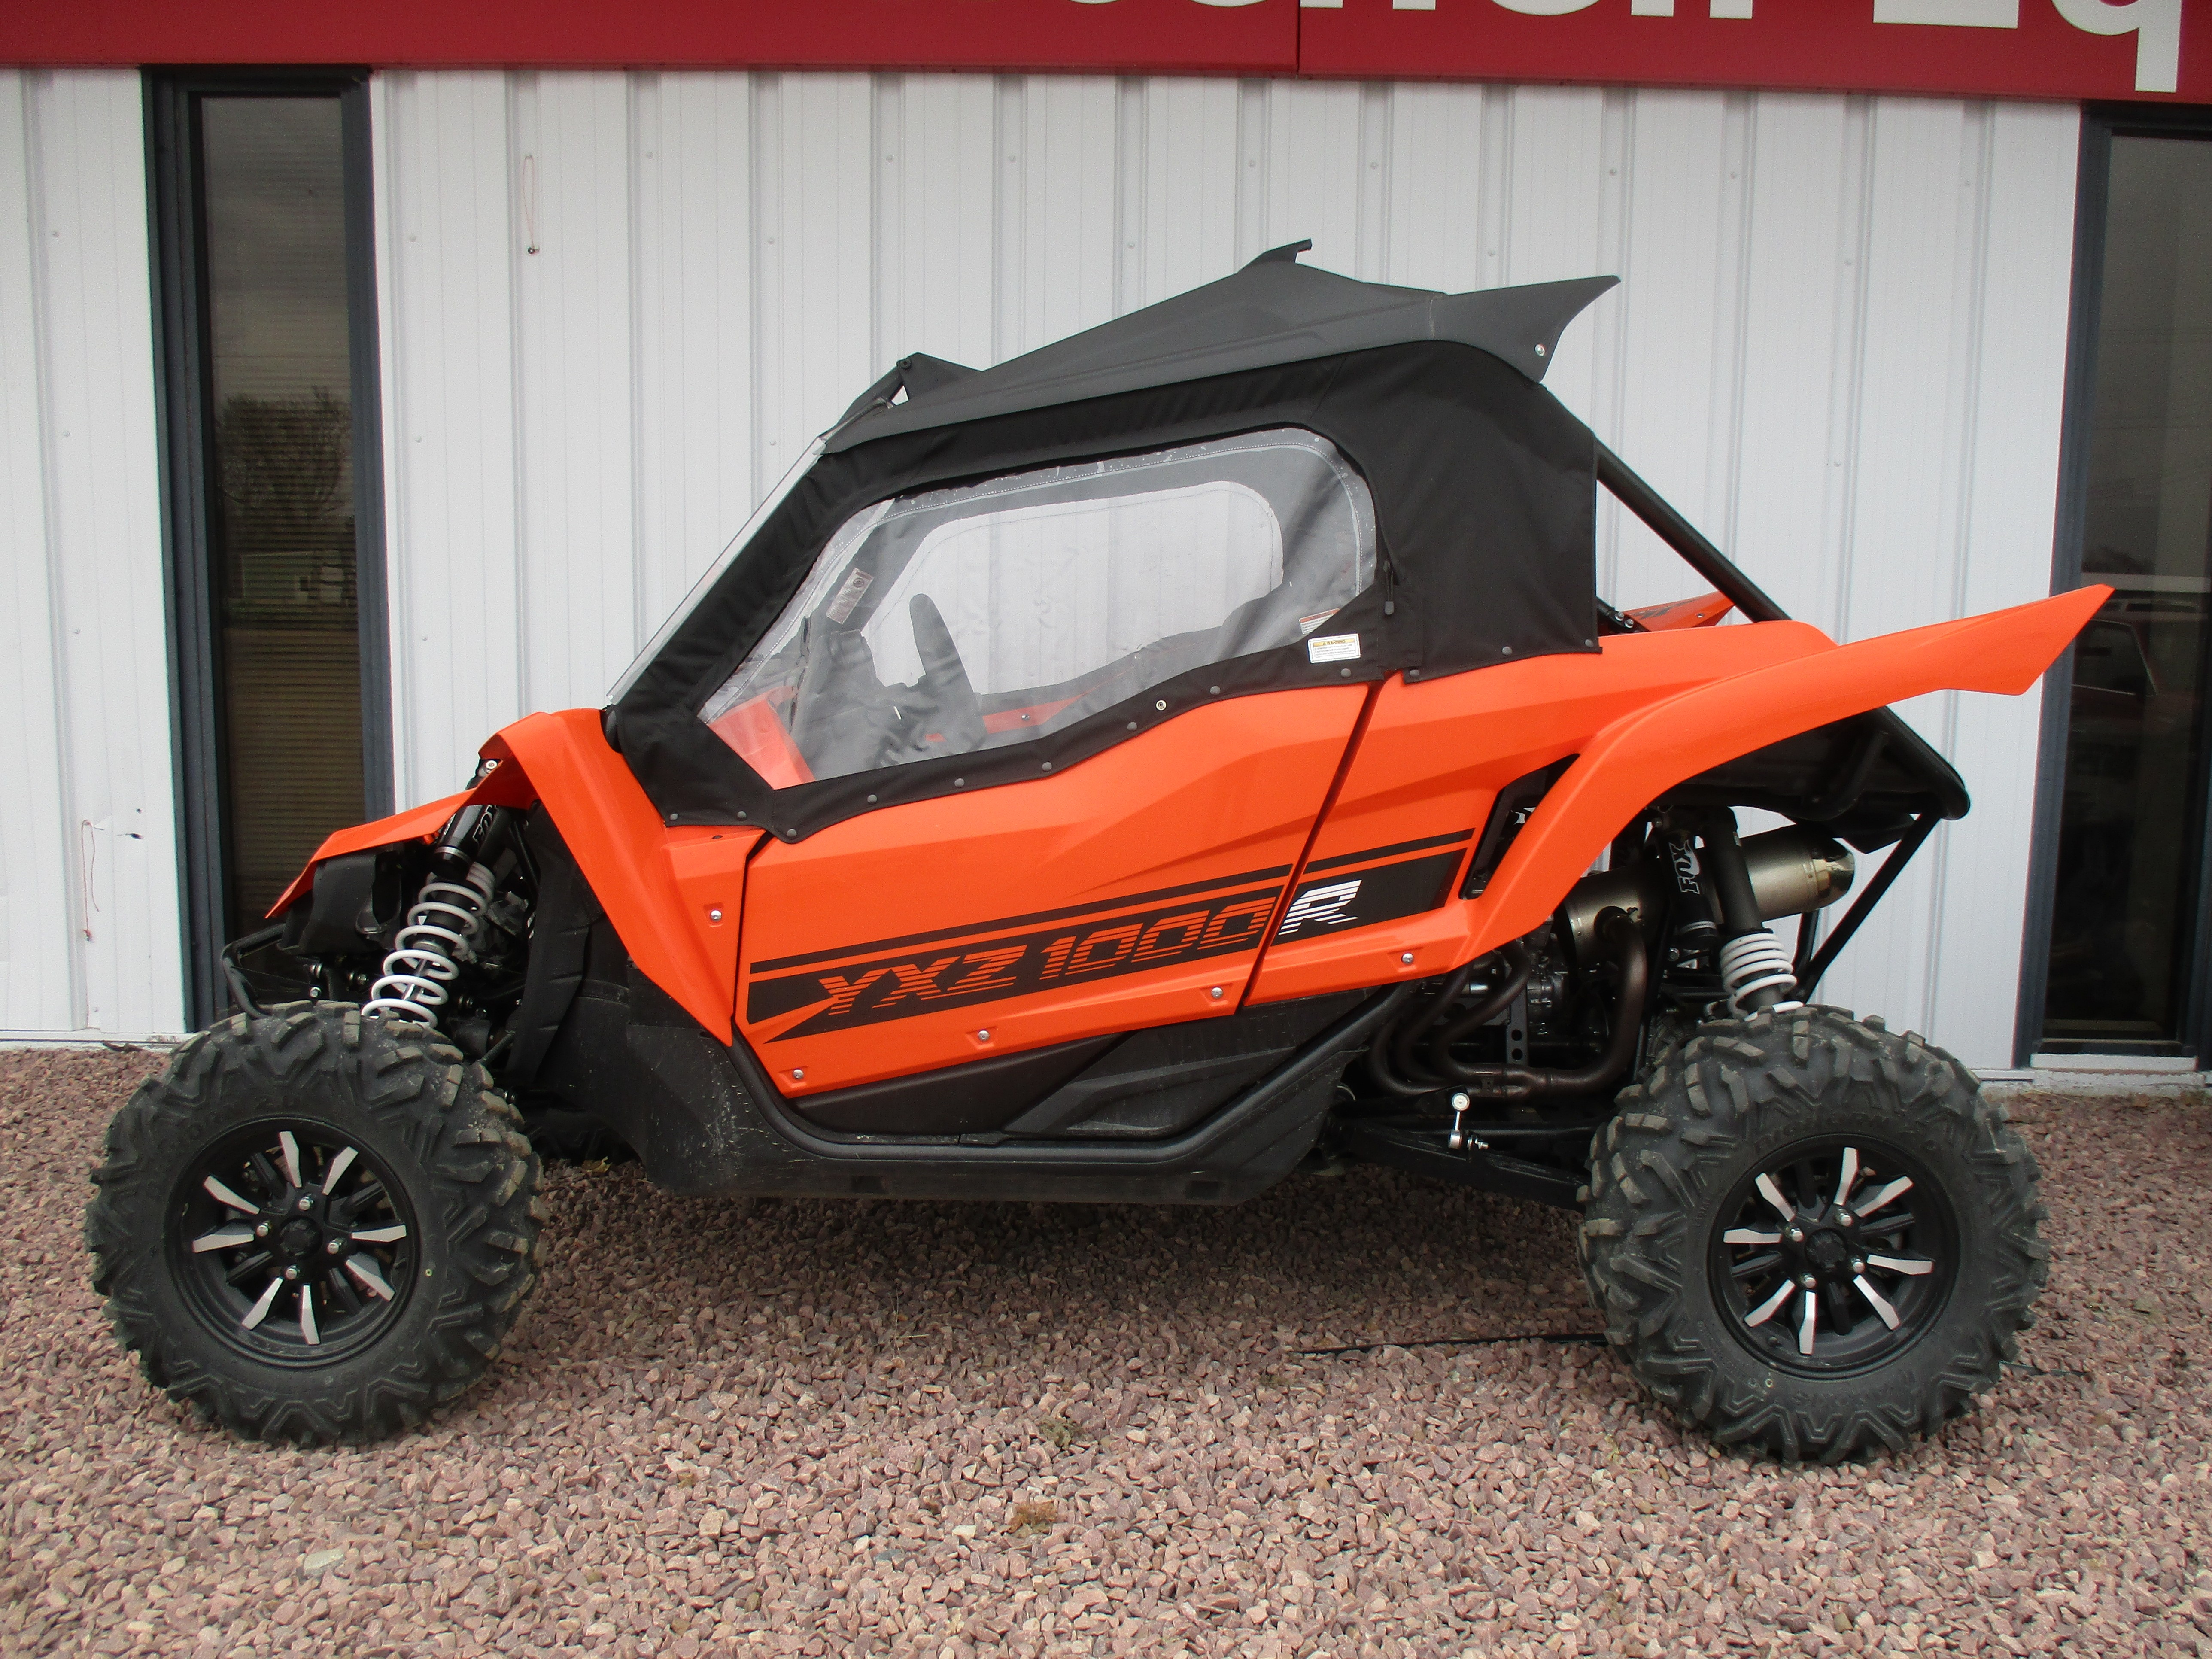 2016 Yamaha YXZ1000R Blaze Orange / Black